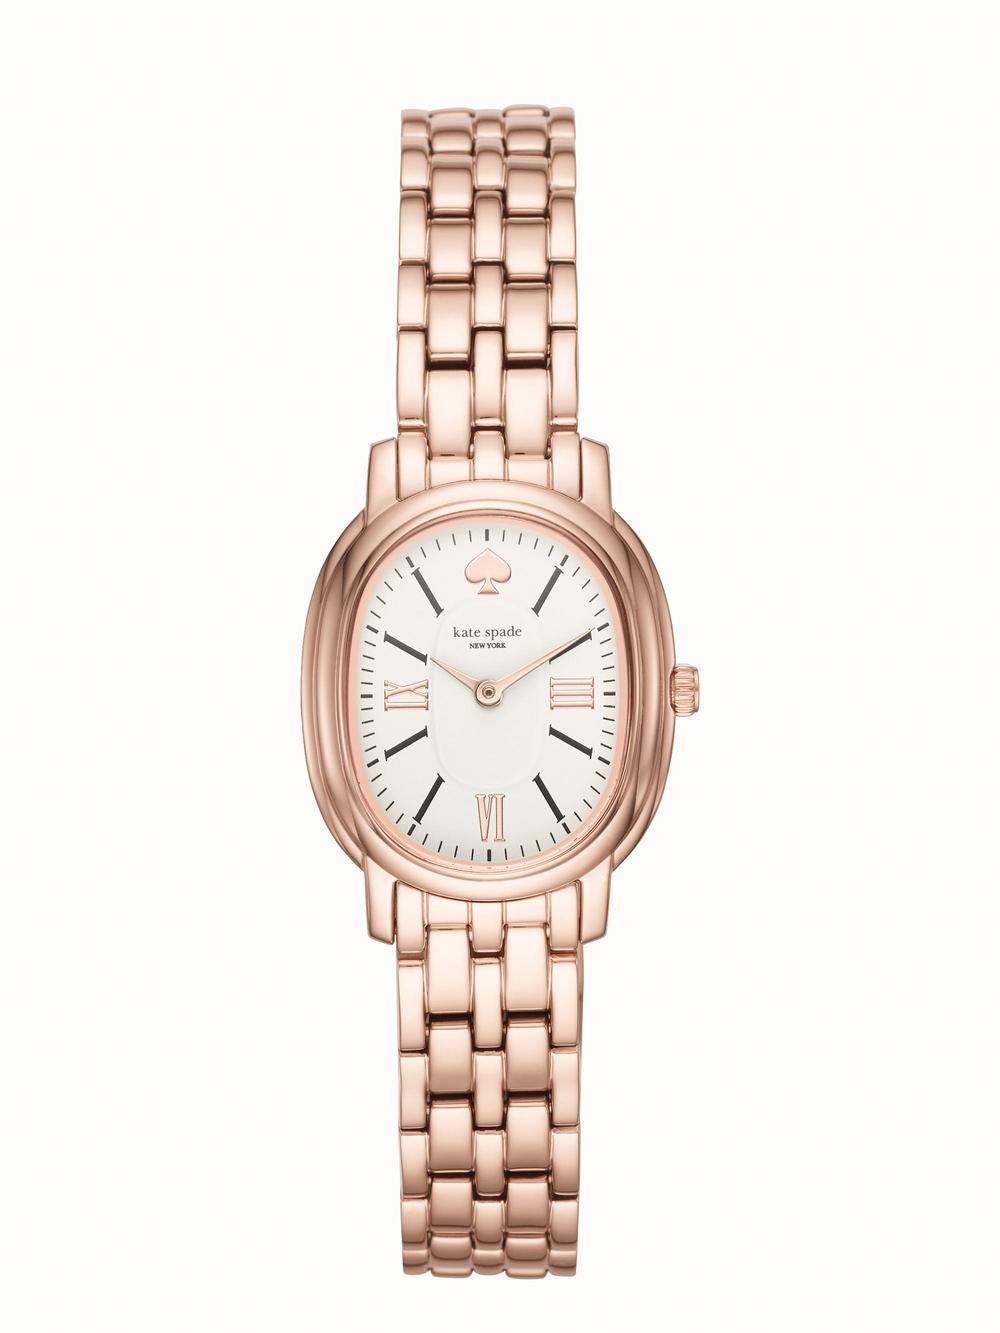 kate spade new york(ケイト・スペード・ニューヨーク) 腕時計